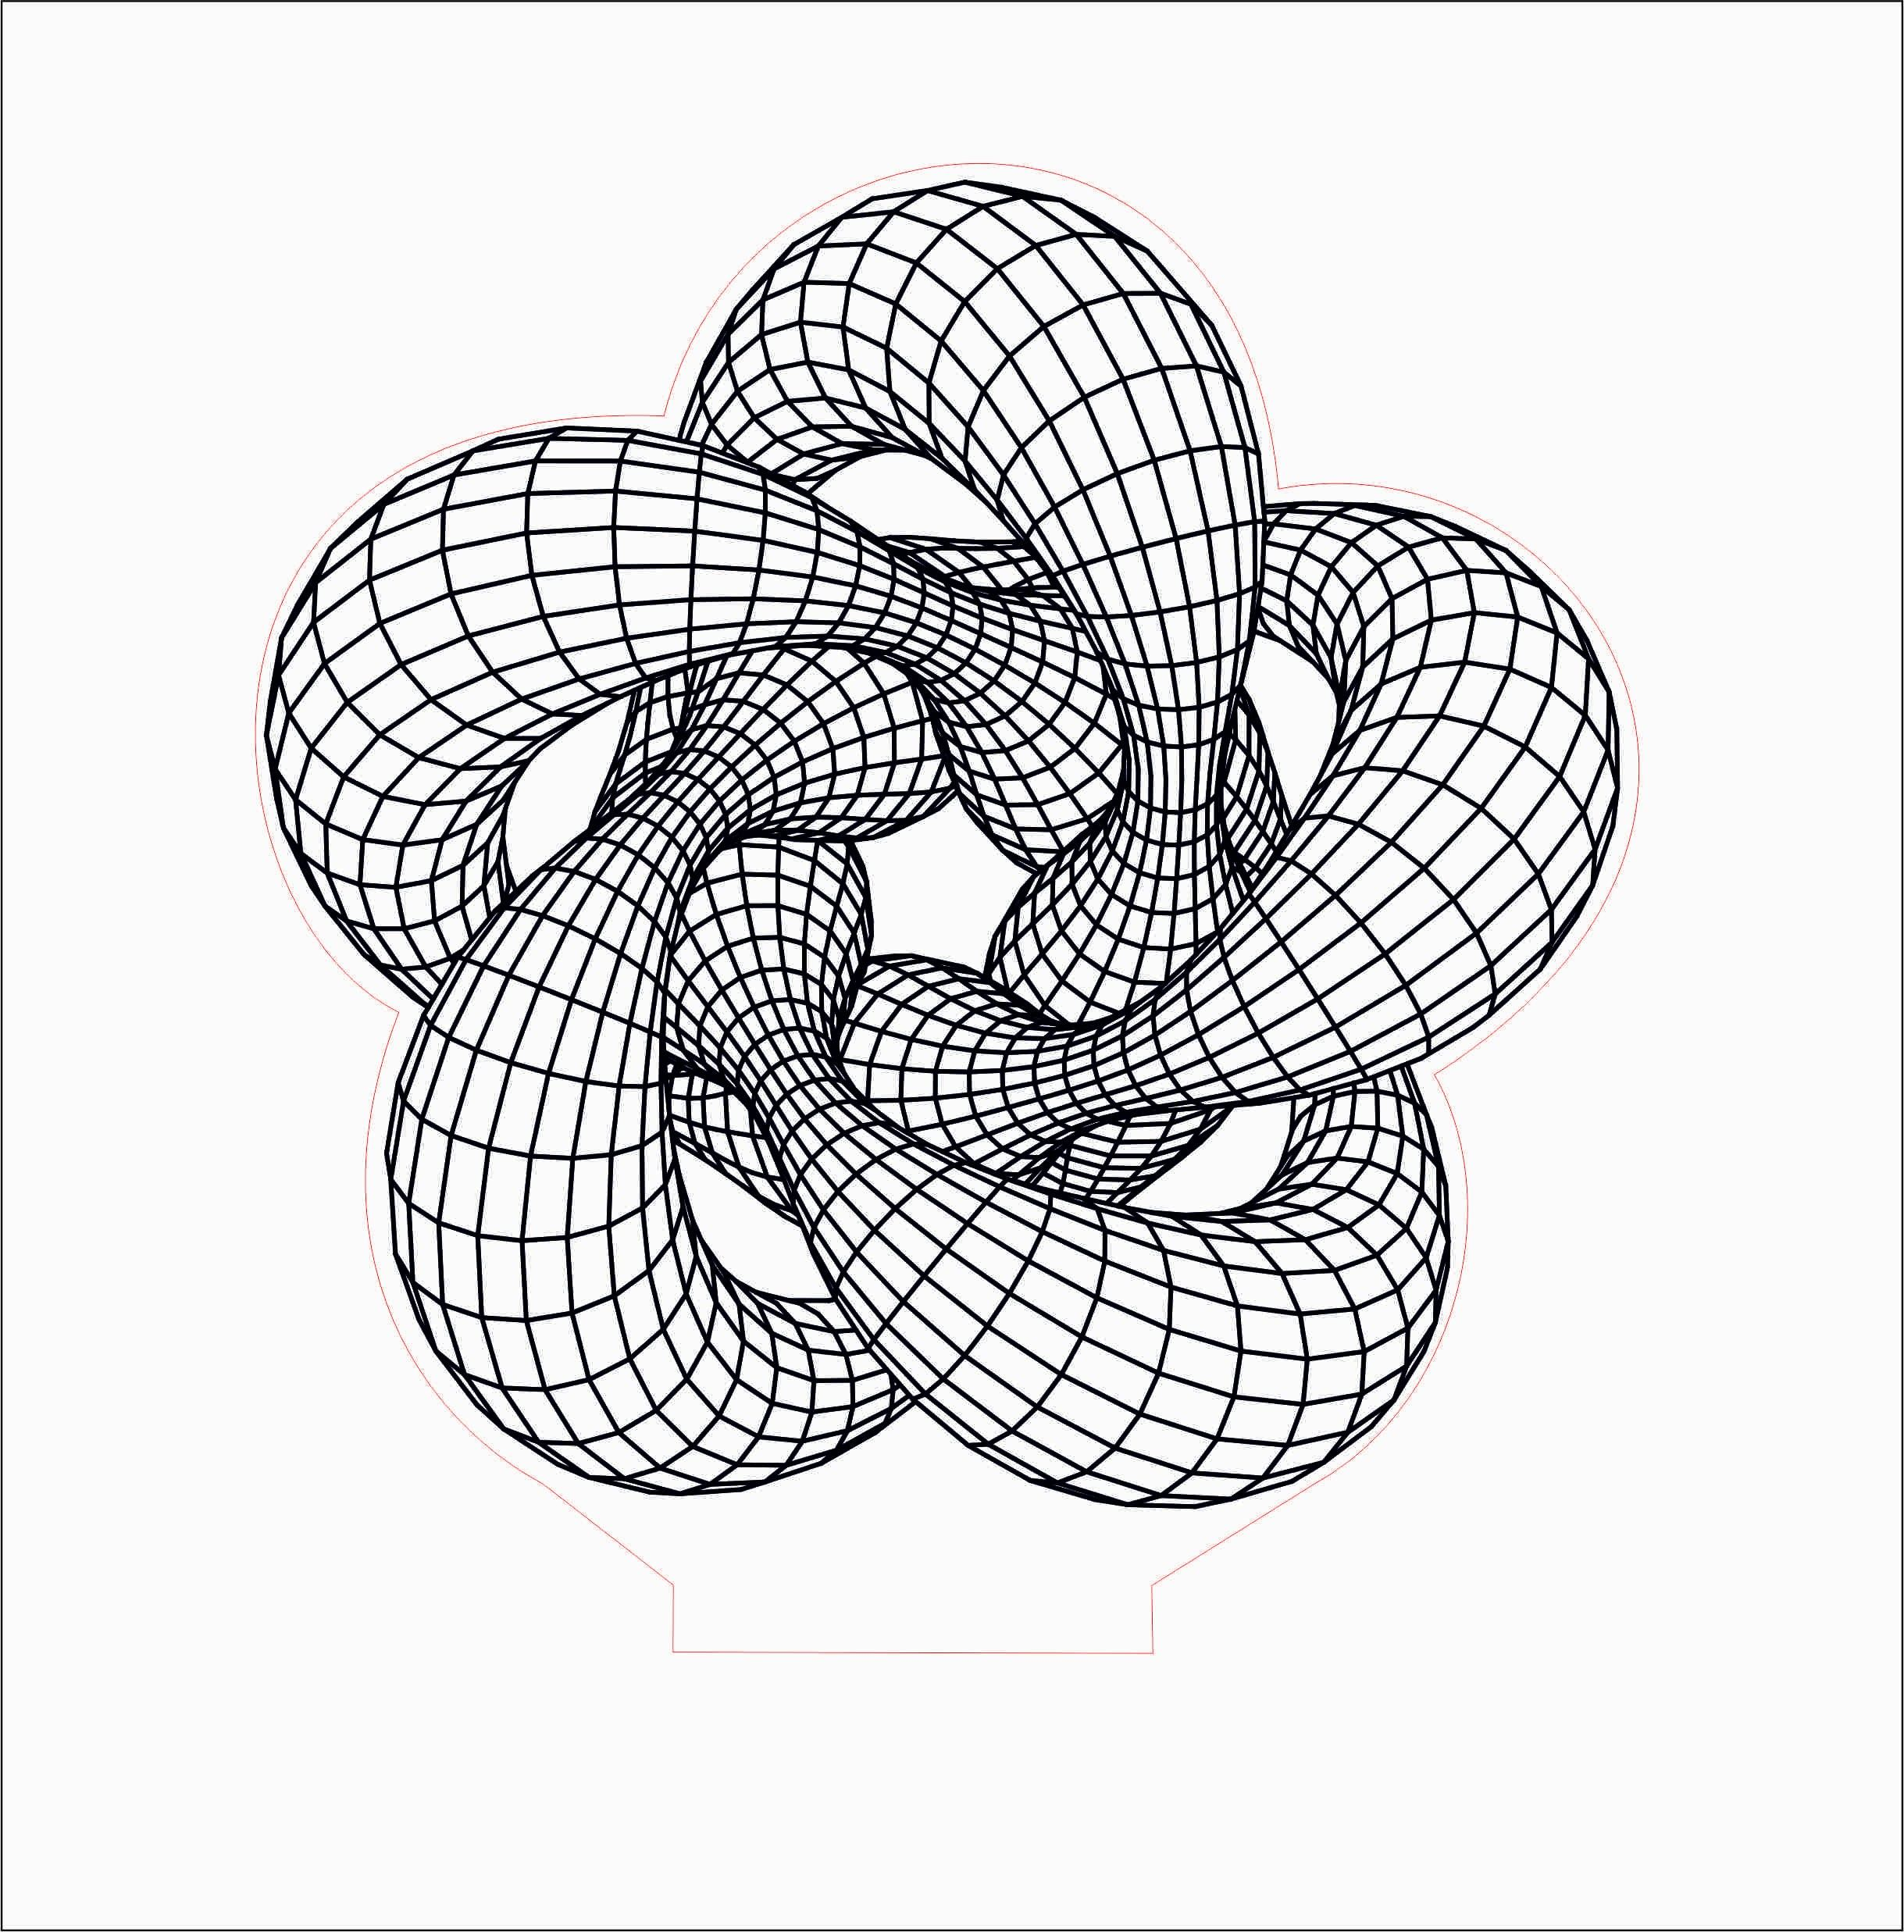 Pin By Luana Bermudez On Acrylic Lamp Mandala Drawing 3d Illusions Wall Drawing